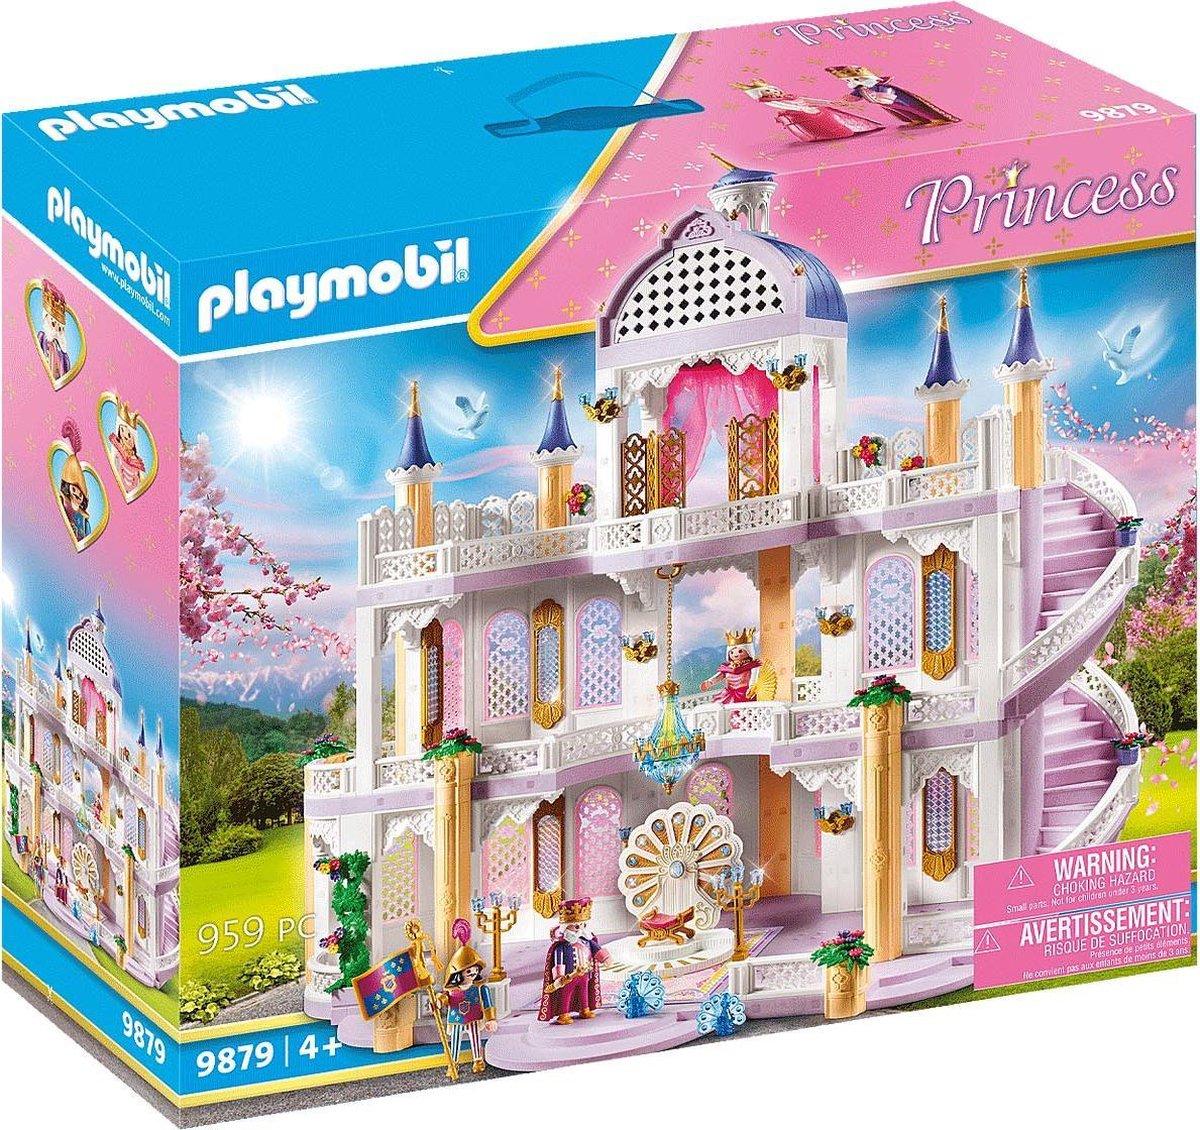 PLAYMOBIL 9879 Playmobil droom kasteel